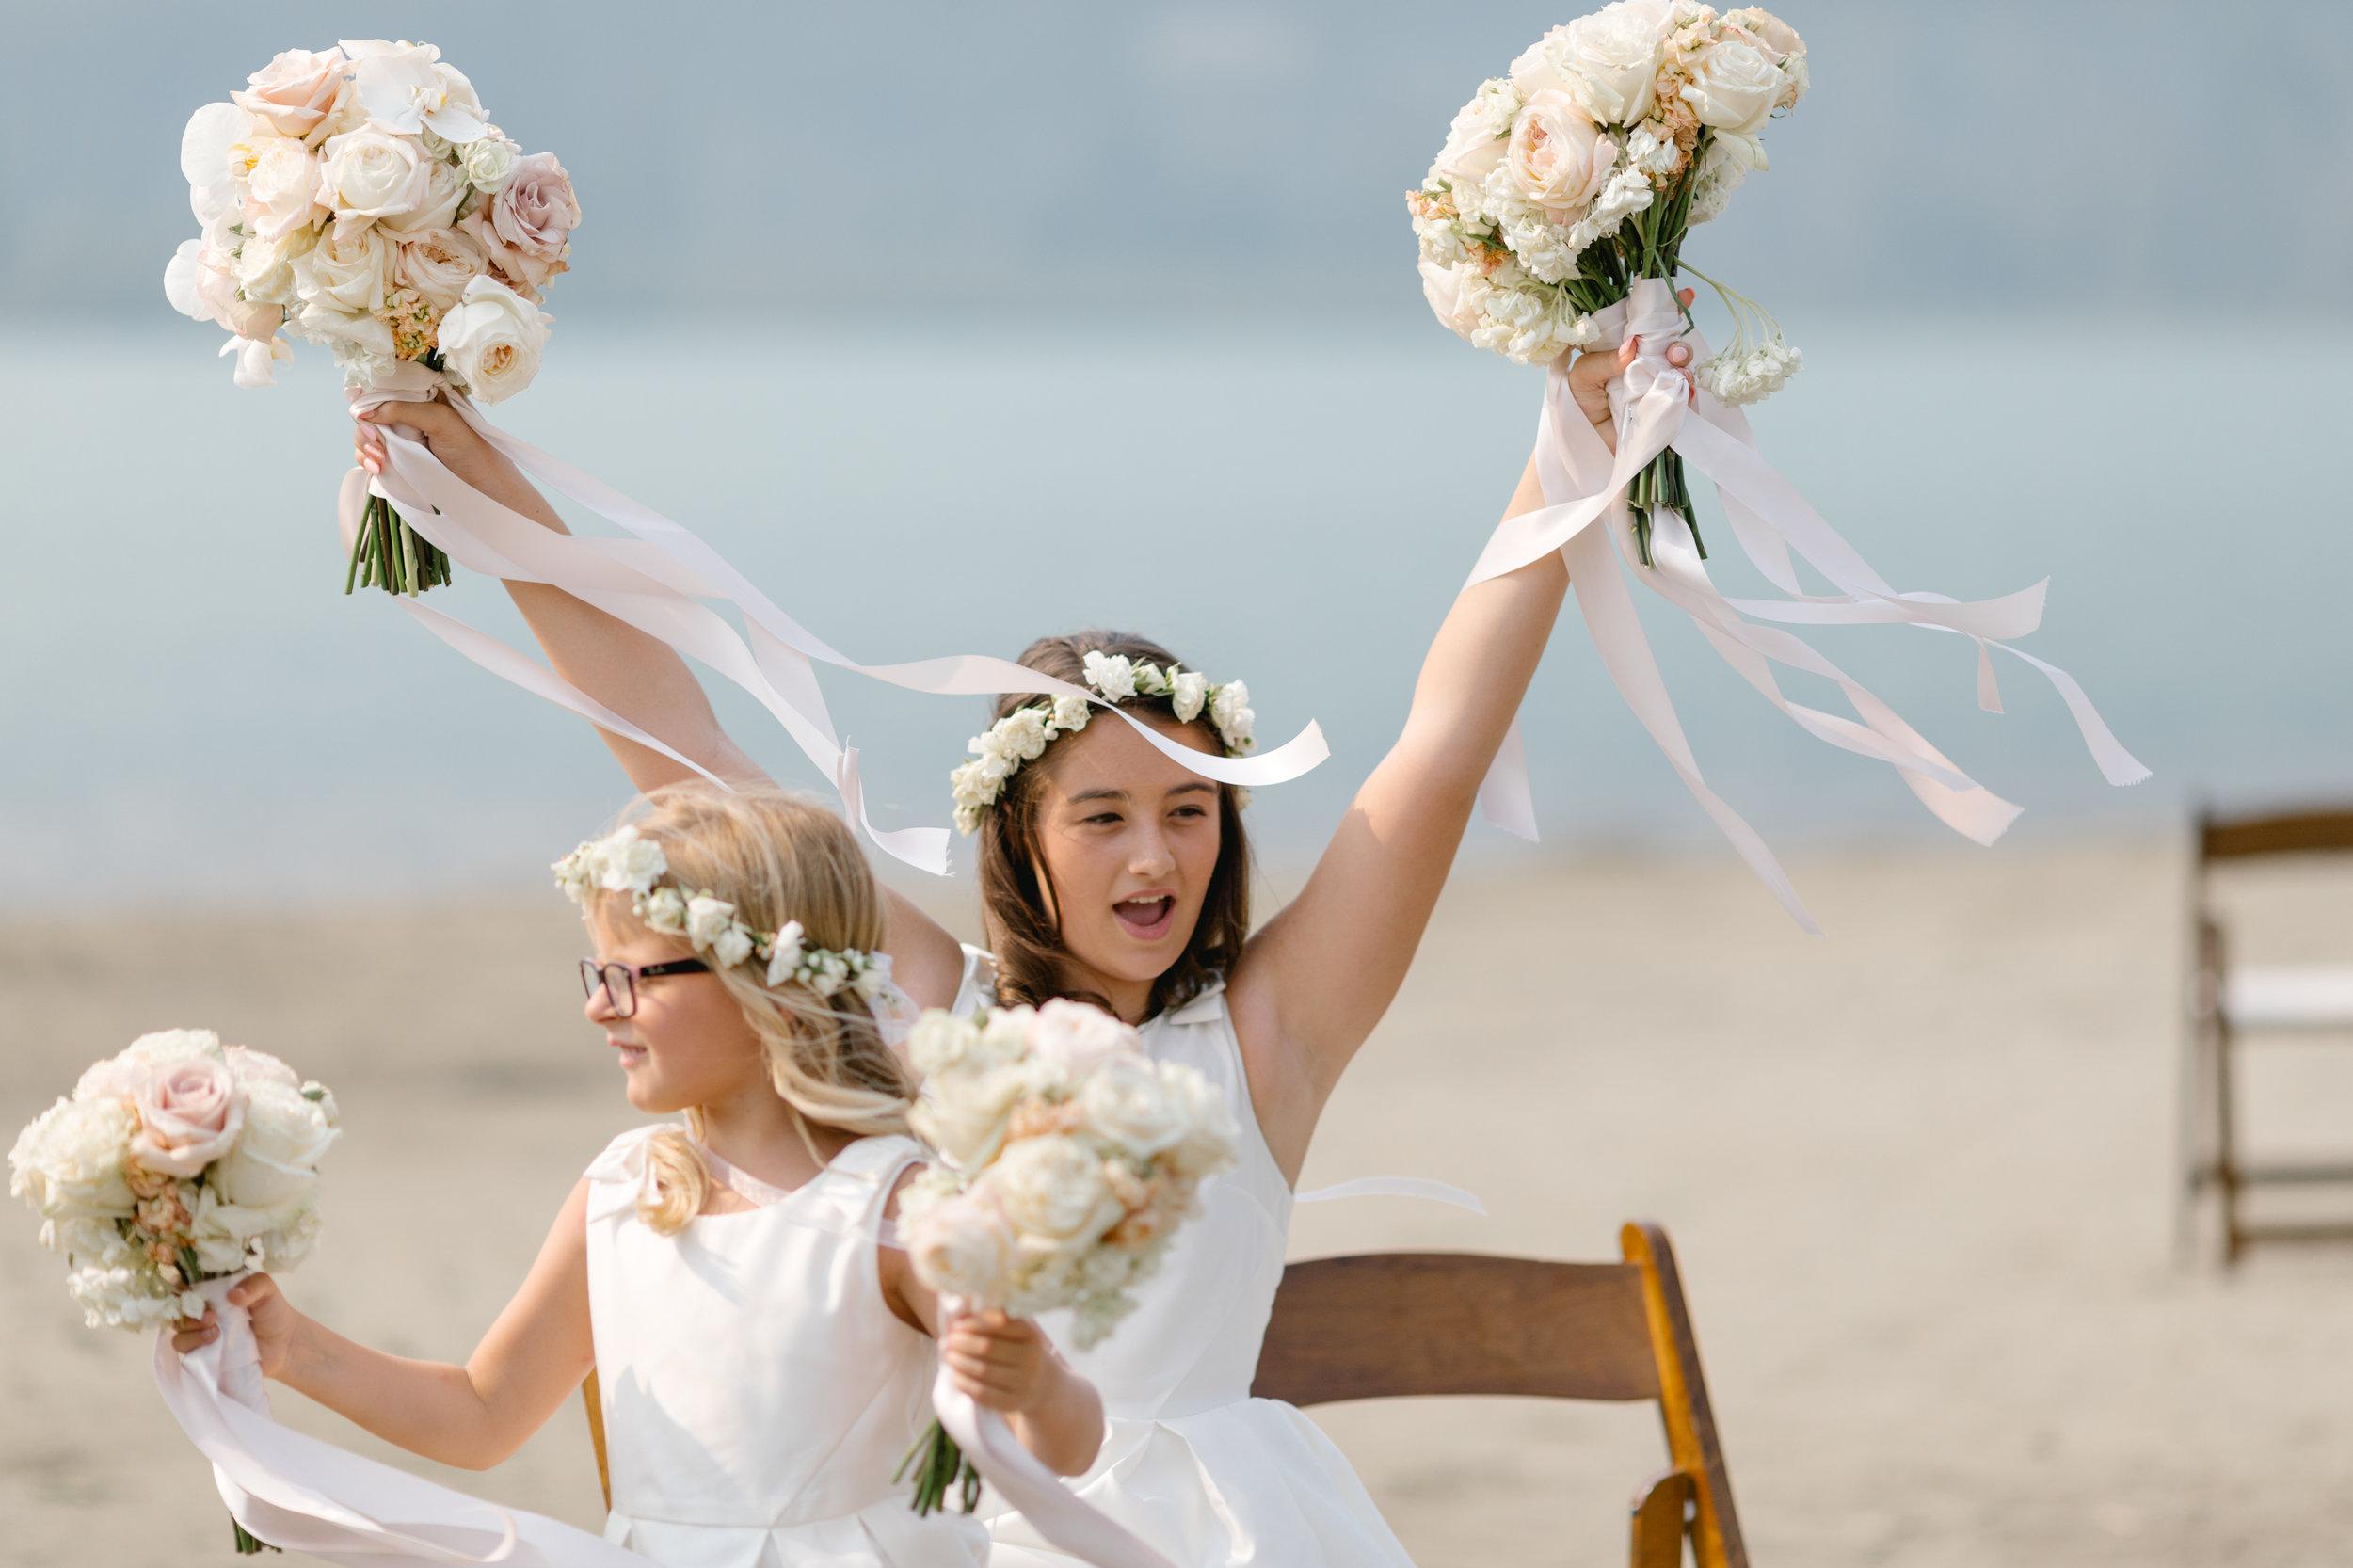 herastudios_wedding_natasha_peter_collectors_package-472.jpg